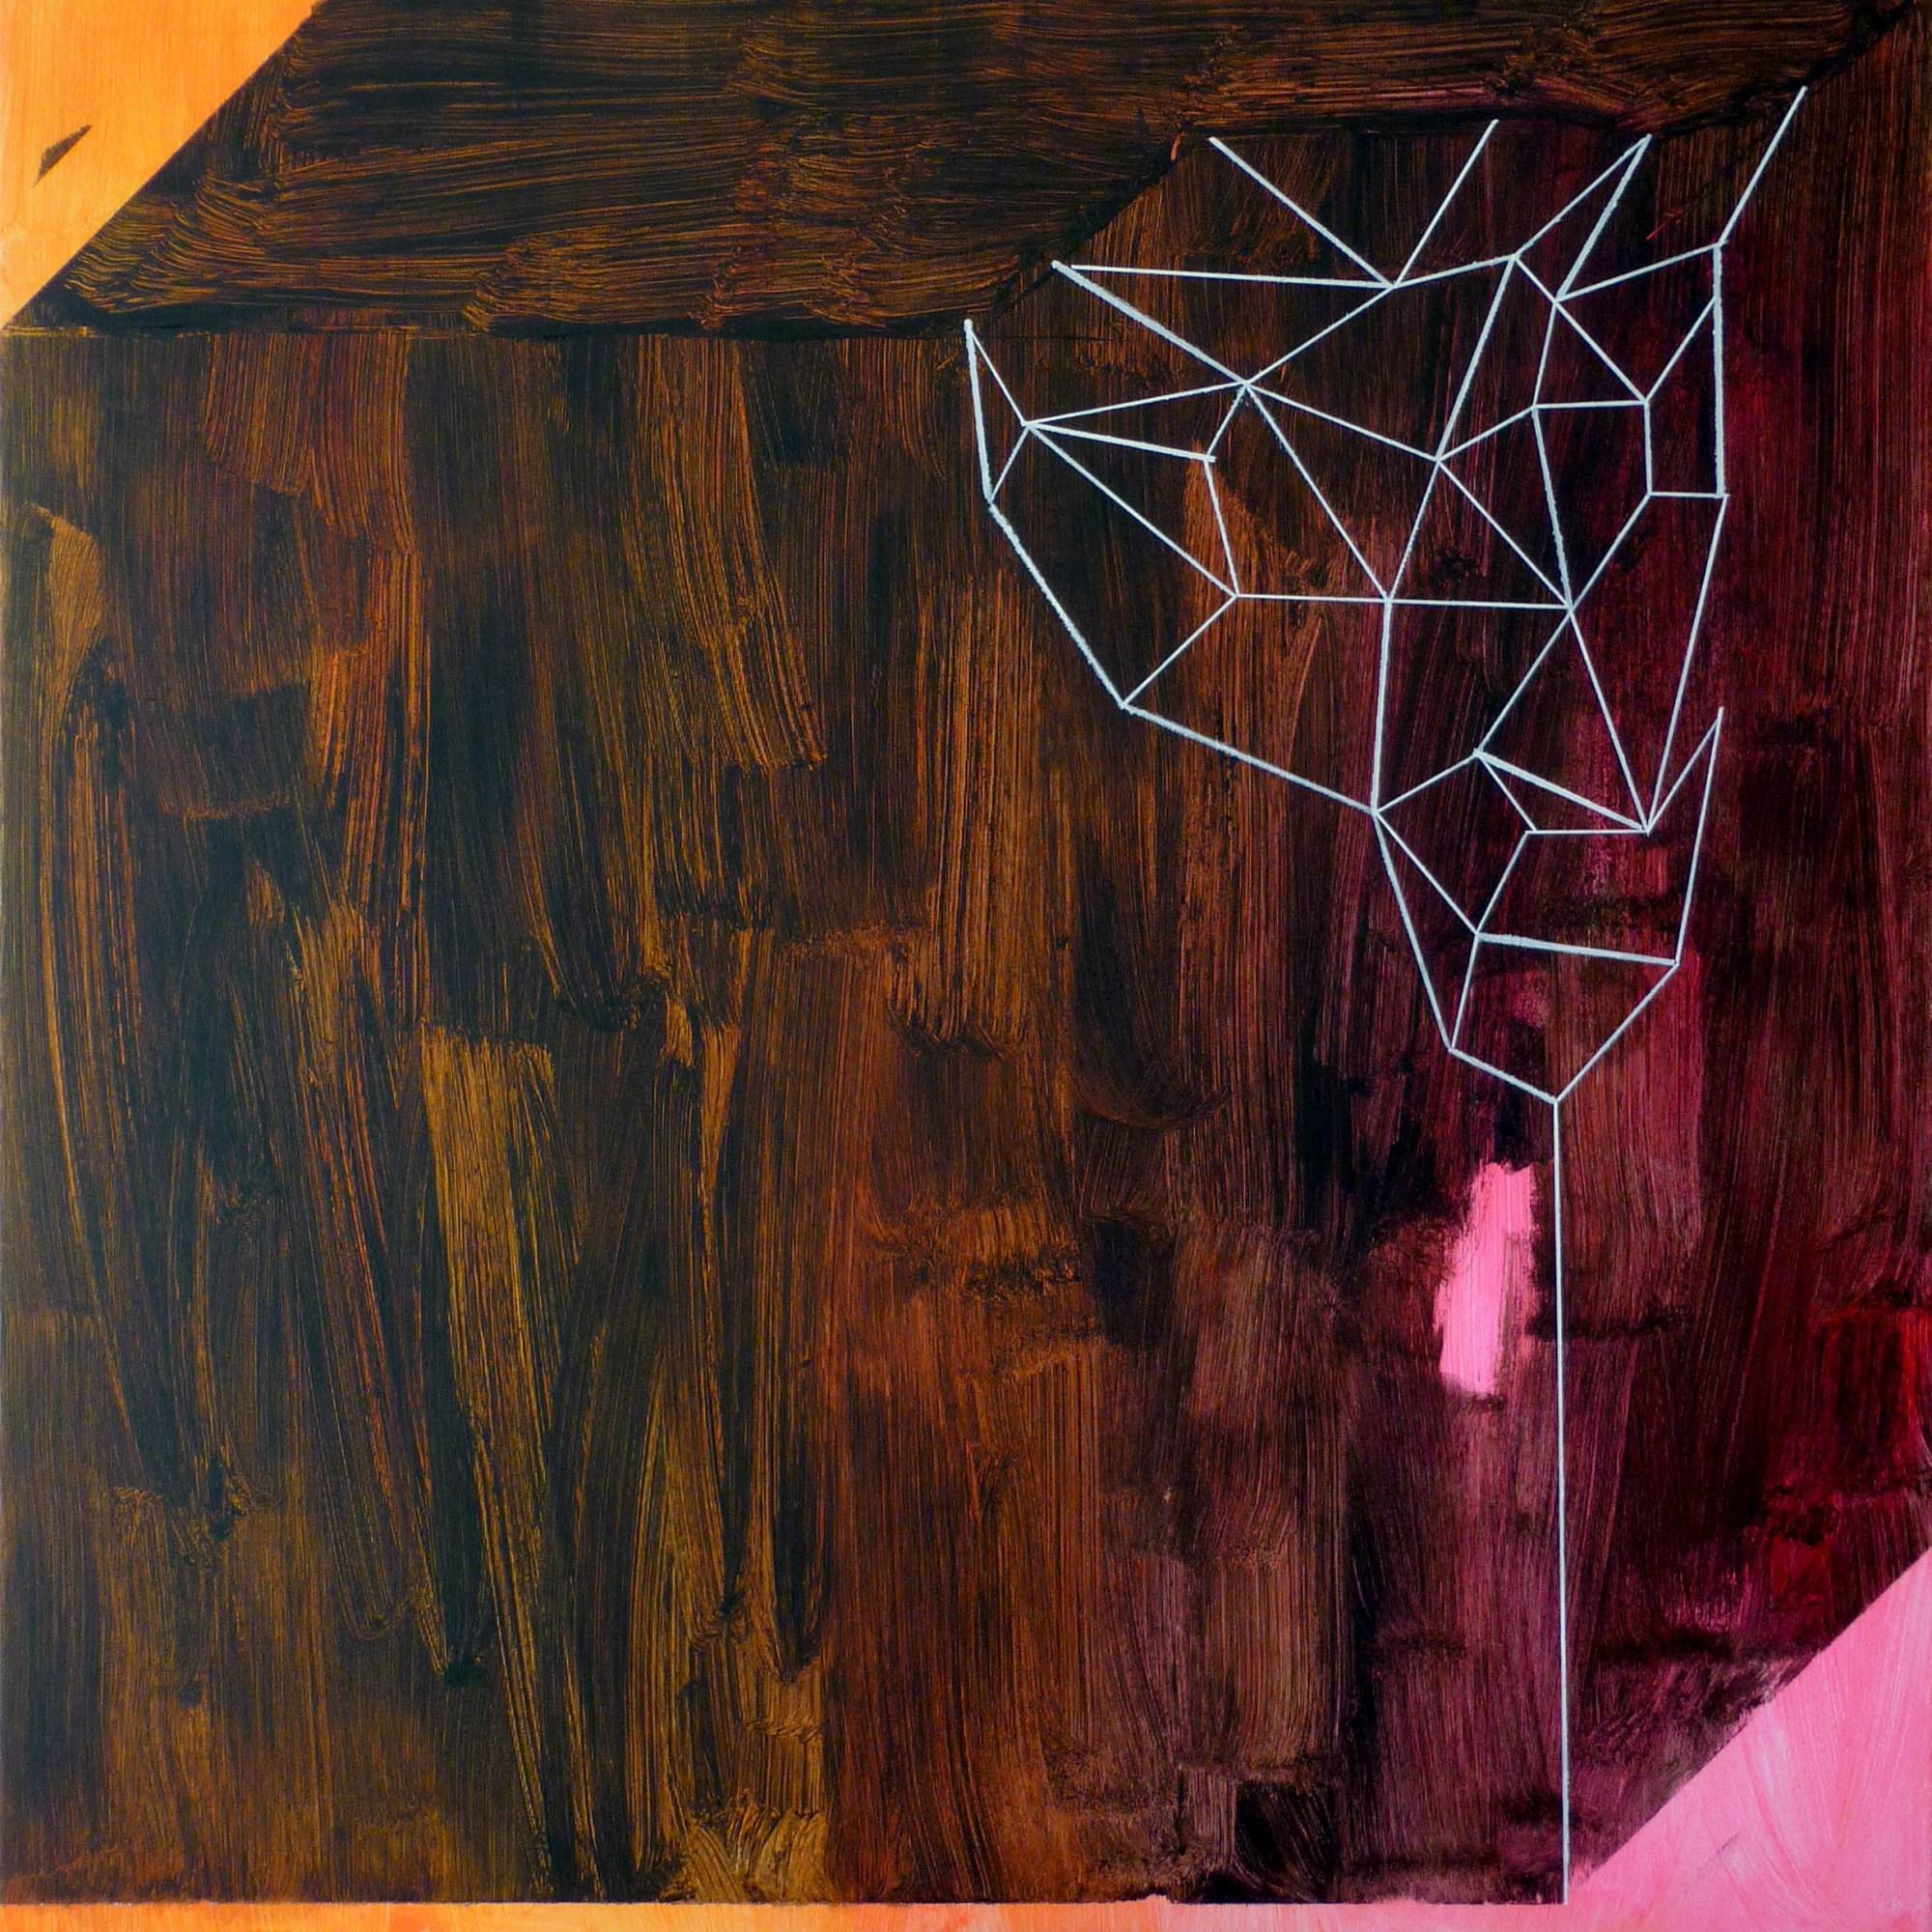 rozbité těžítko / broken paperweight, 95x100 cm, akryl na plátně / acrylic on canvas, 2014